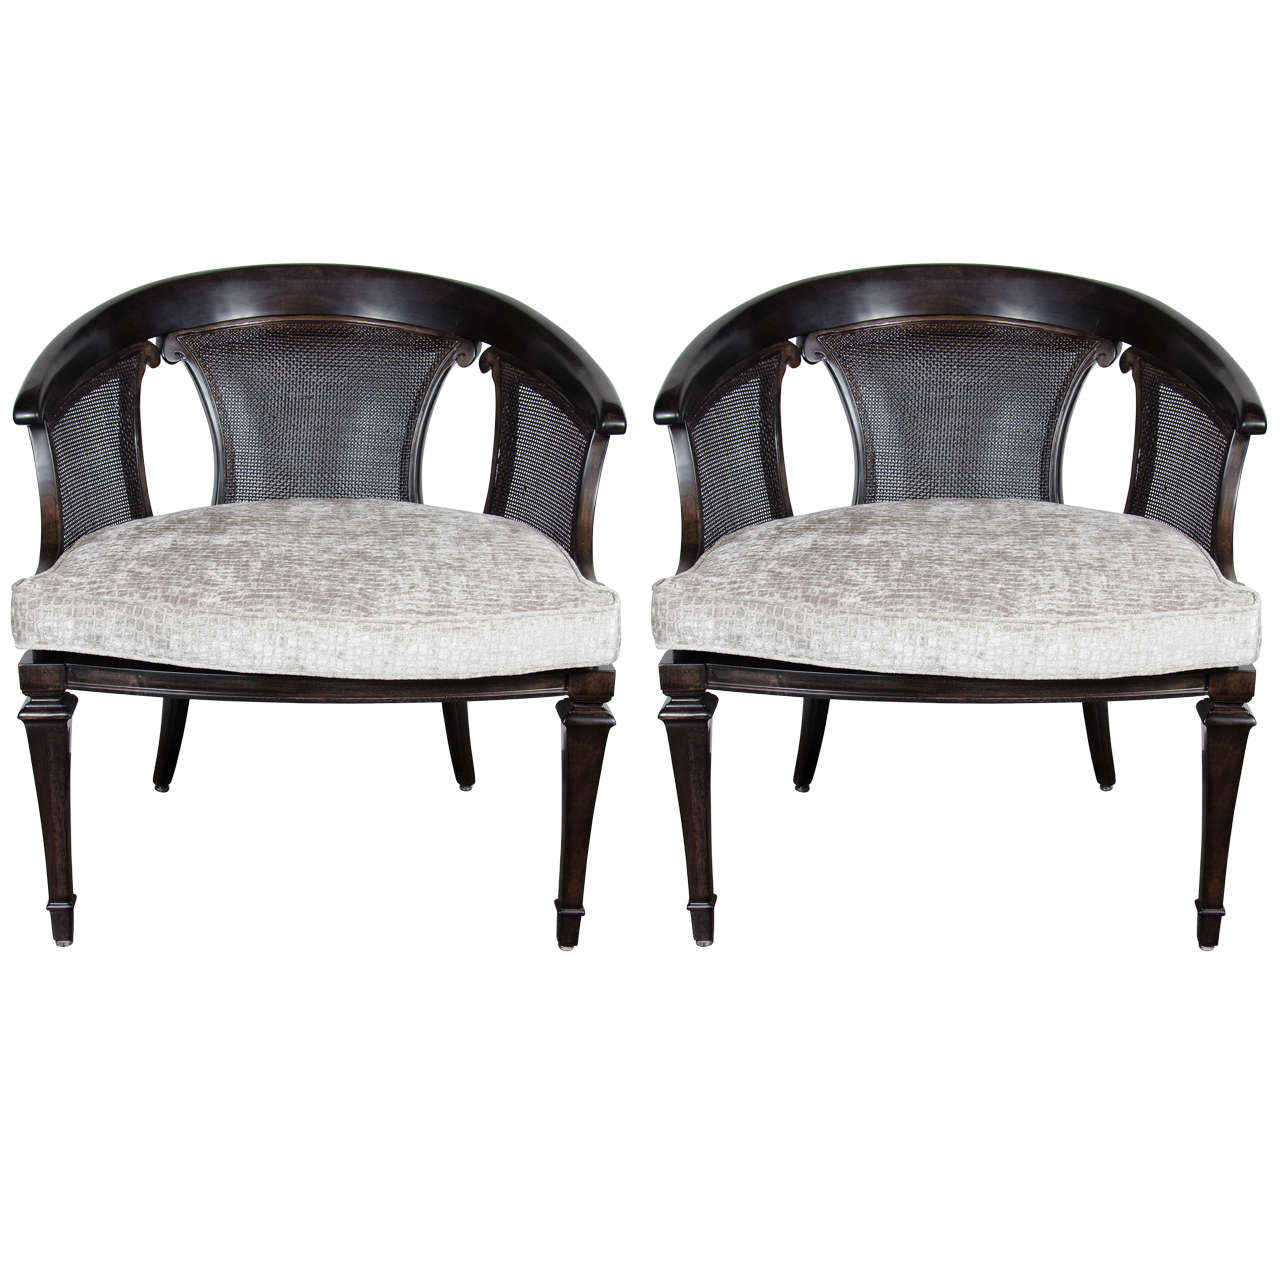 Chic Pair Of Mid Century Modernist Ebonized Walnut U0026 Cane Occasional Chairs  1